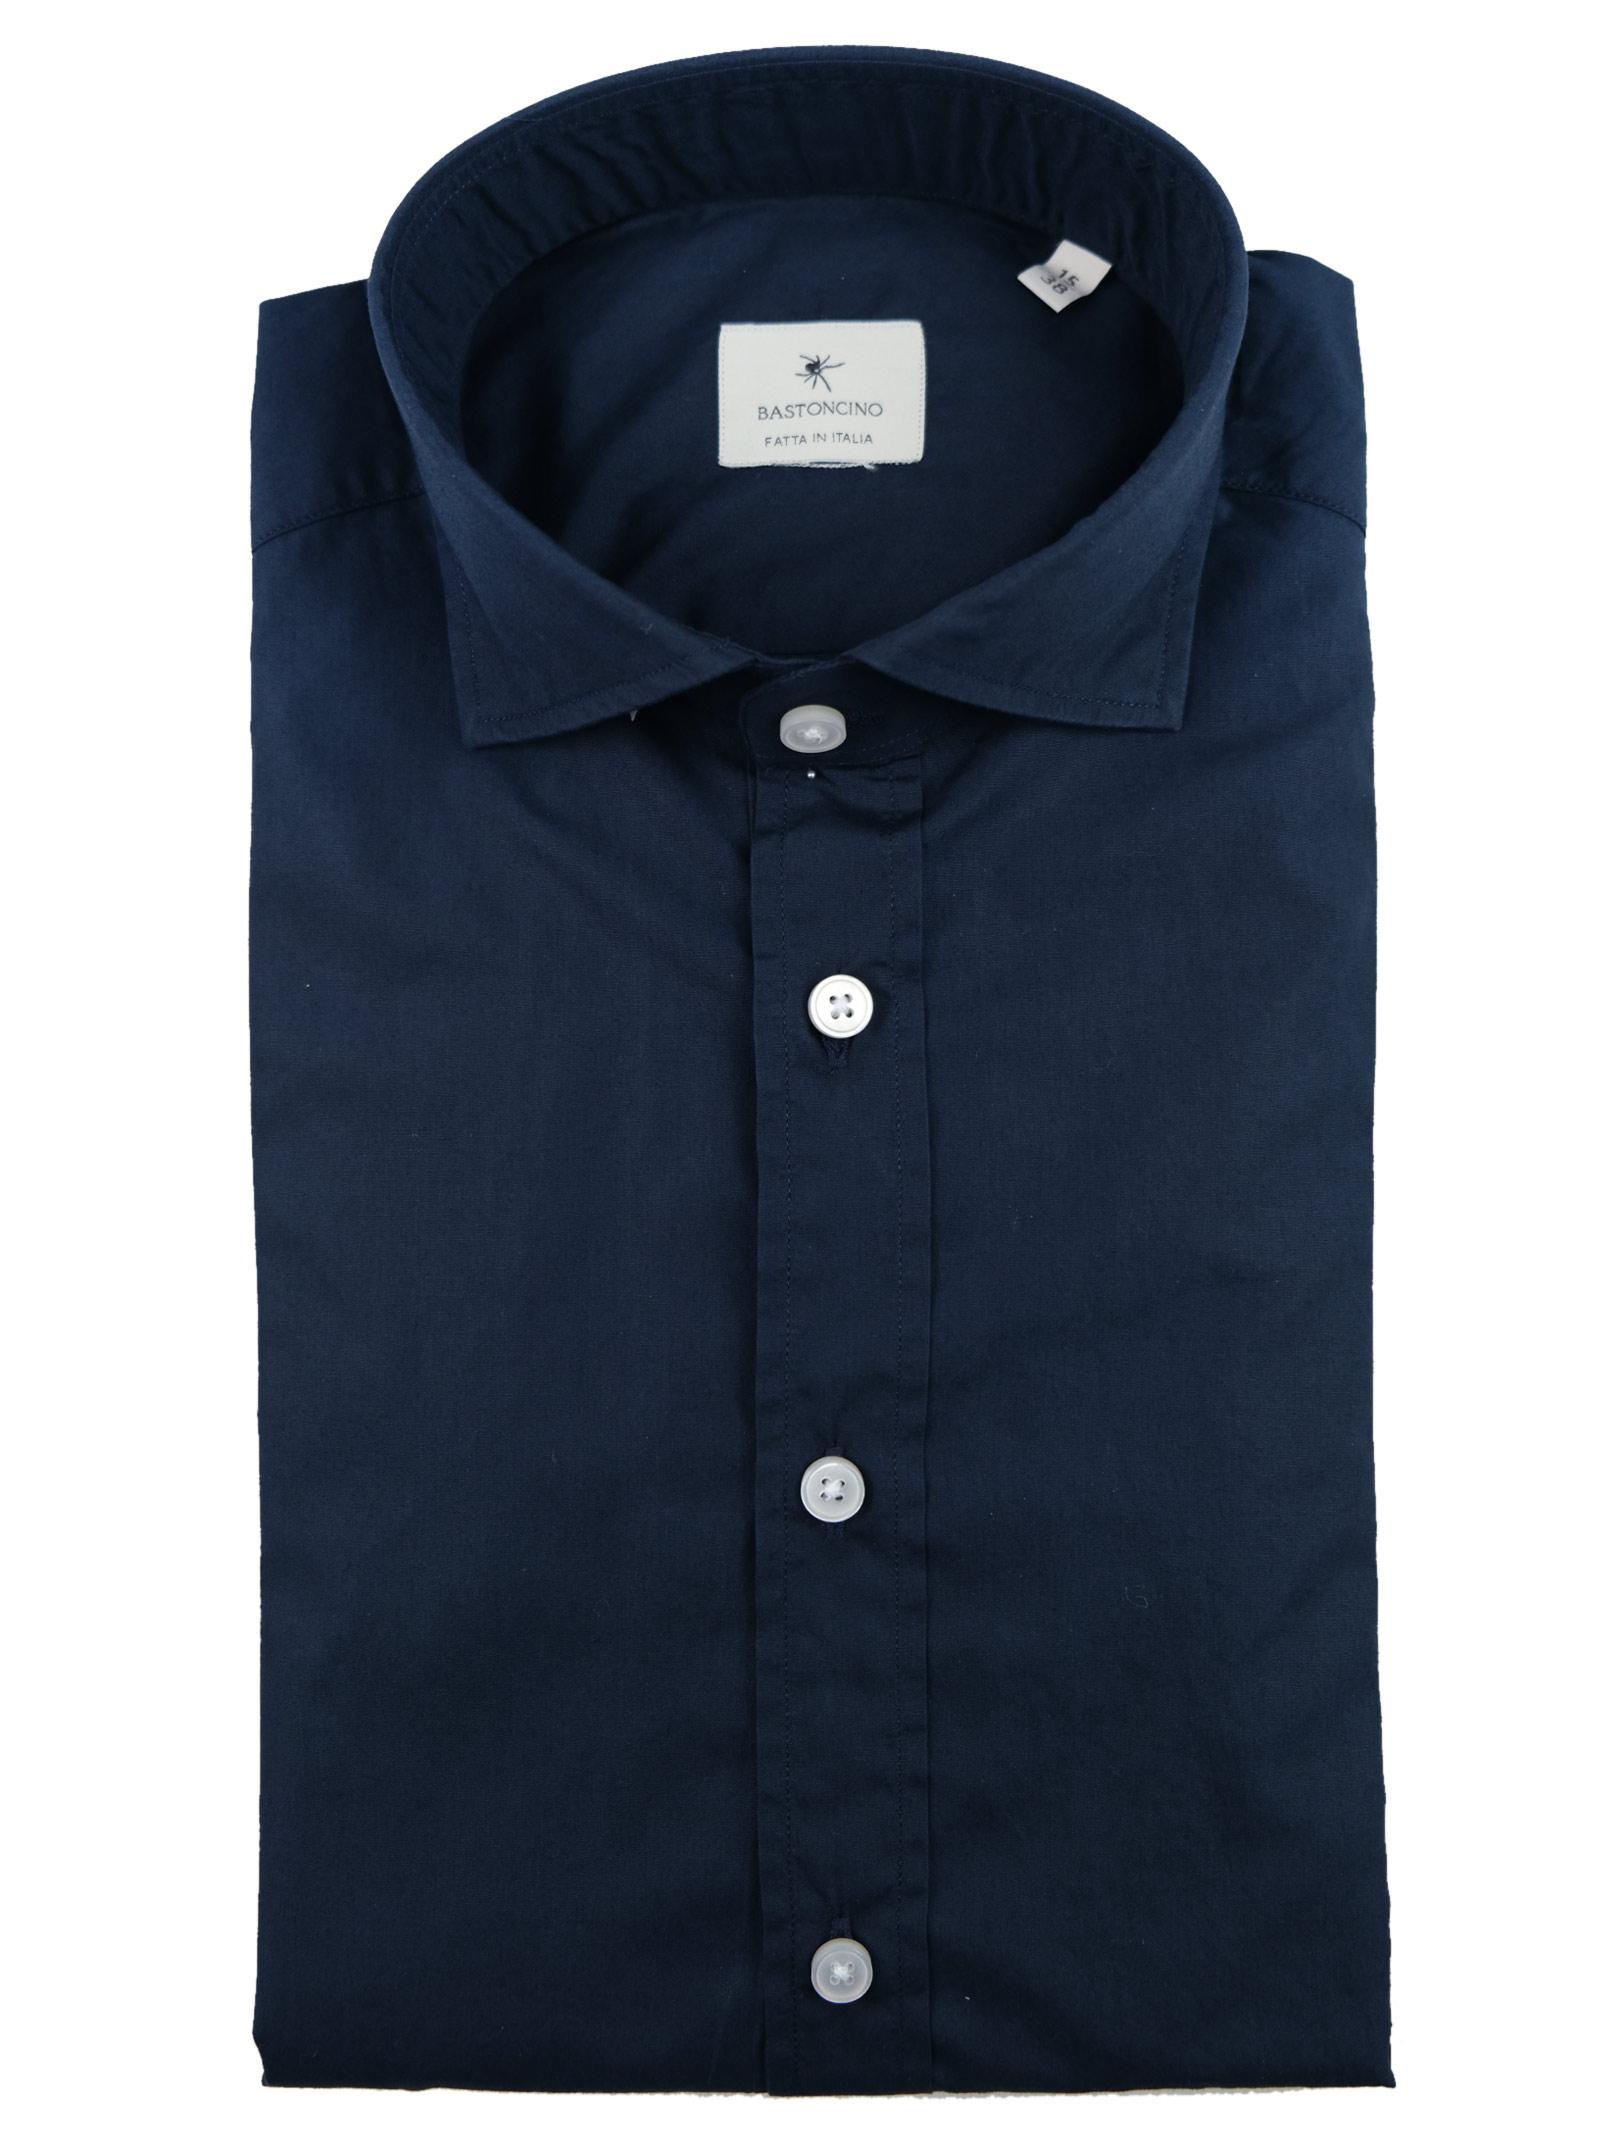 Casual shirt BASTONCINO | Shirts | MAR REG1859 04